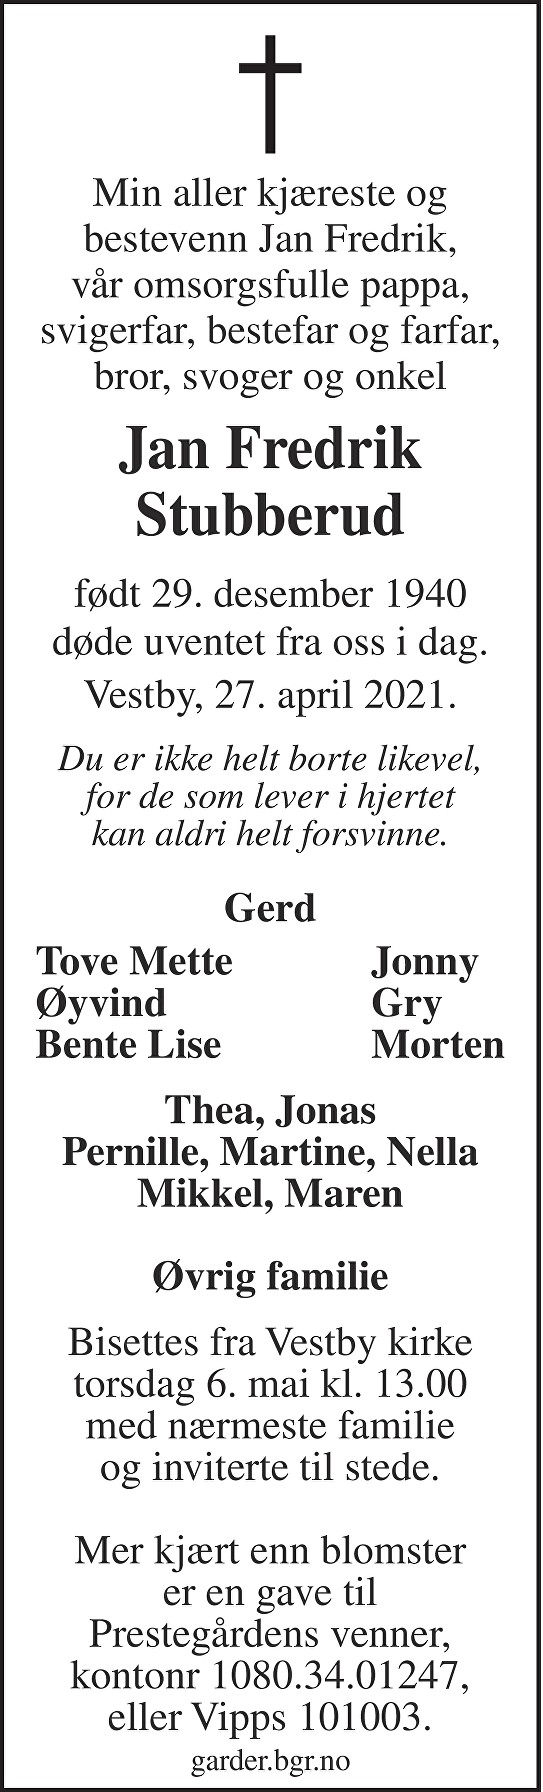 Jan Fredrik Stubberud Dødsannonse